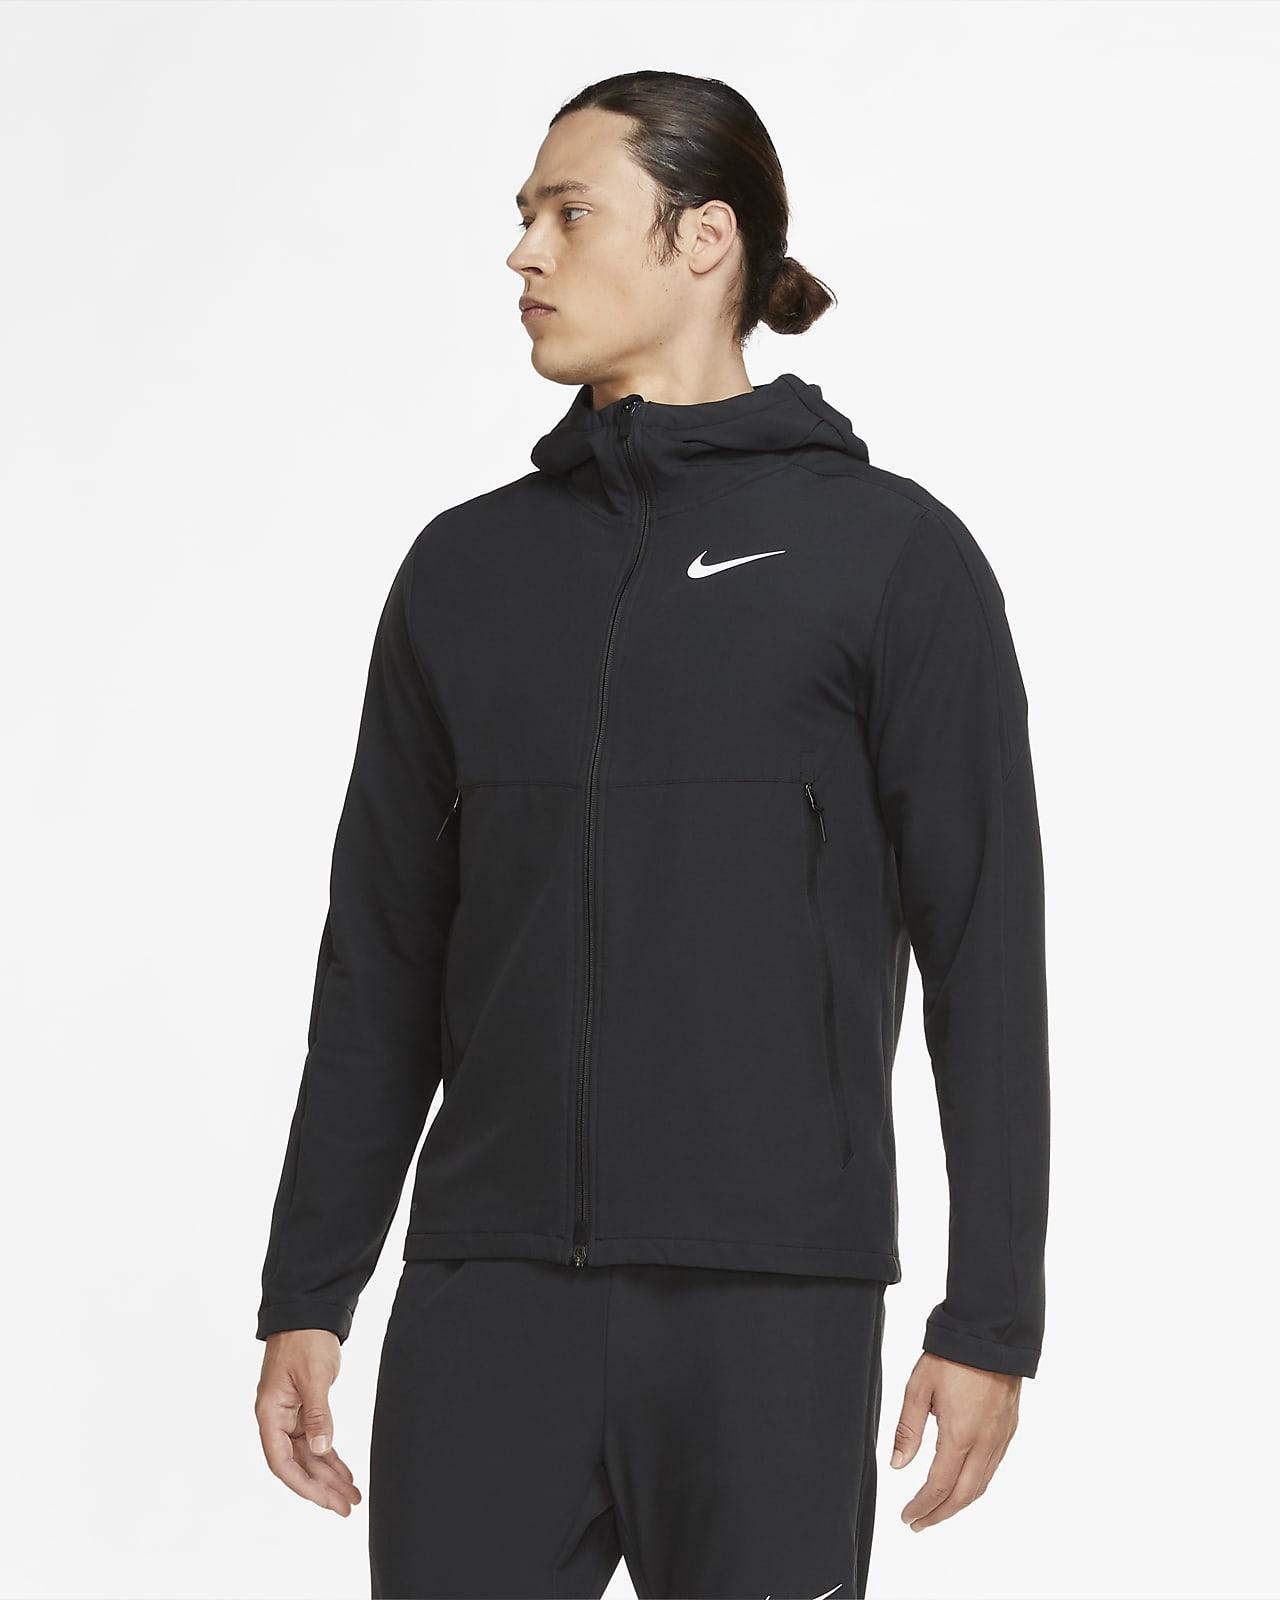 Nike Men's Winterised Woven Training Jacket